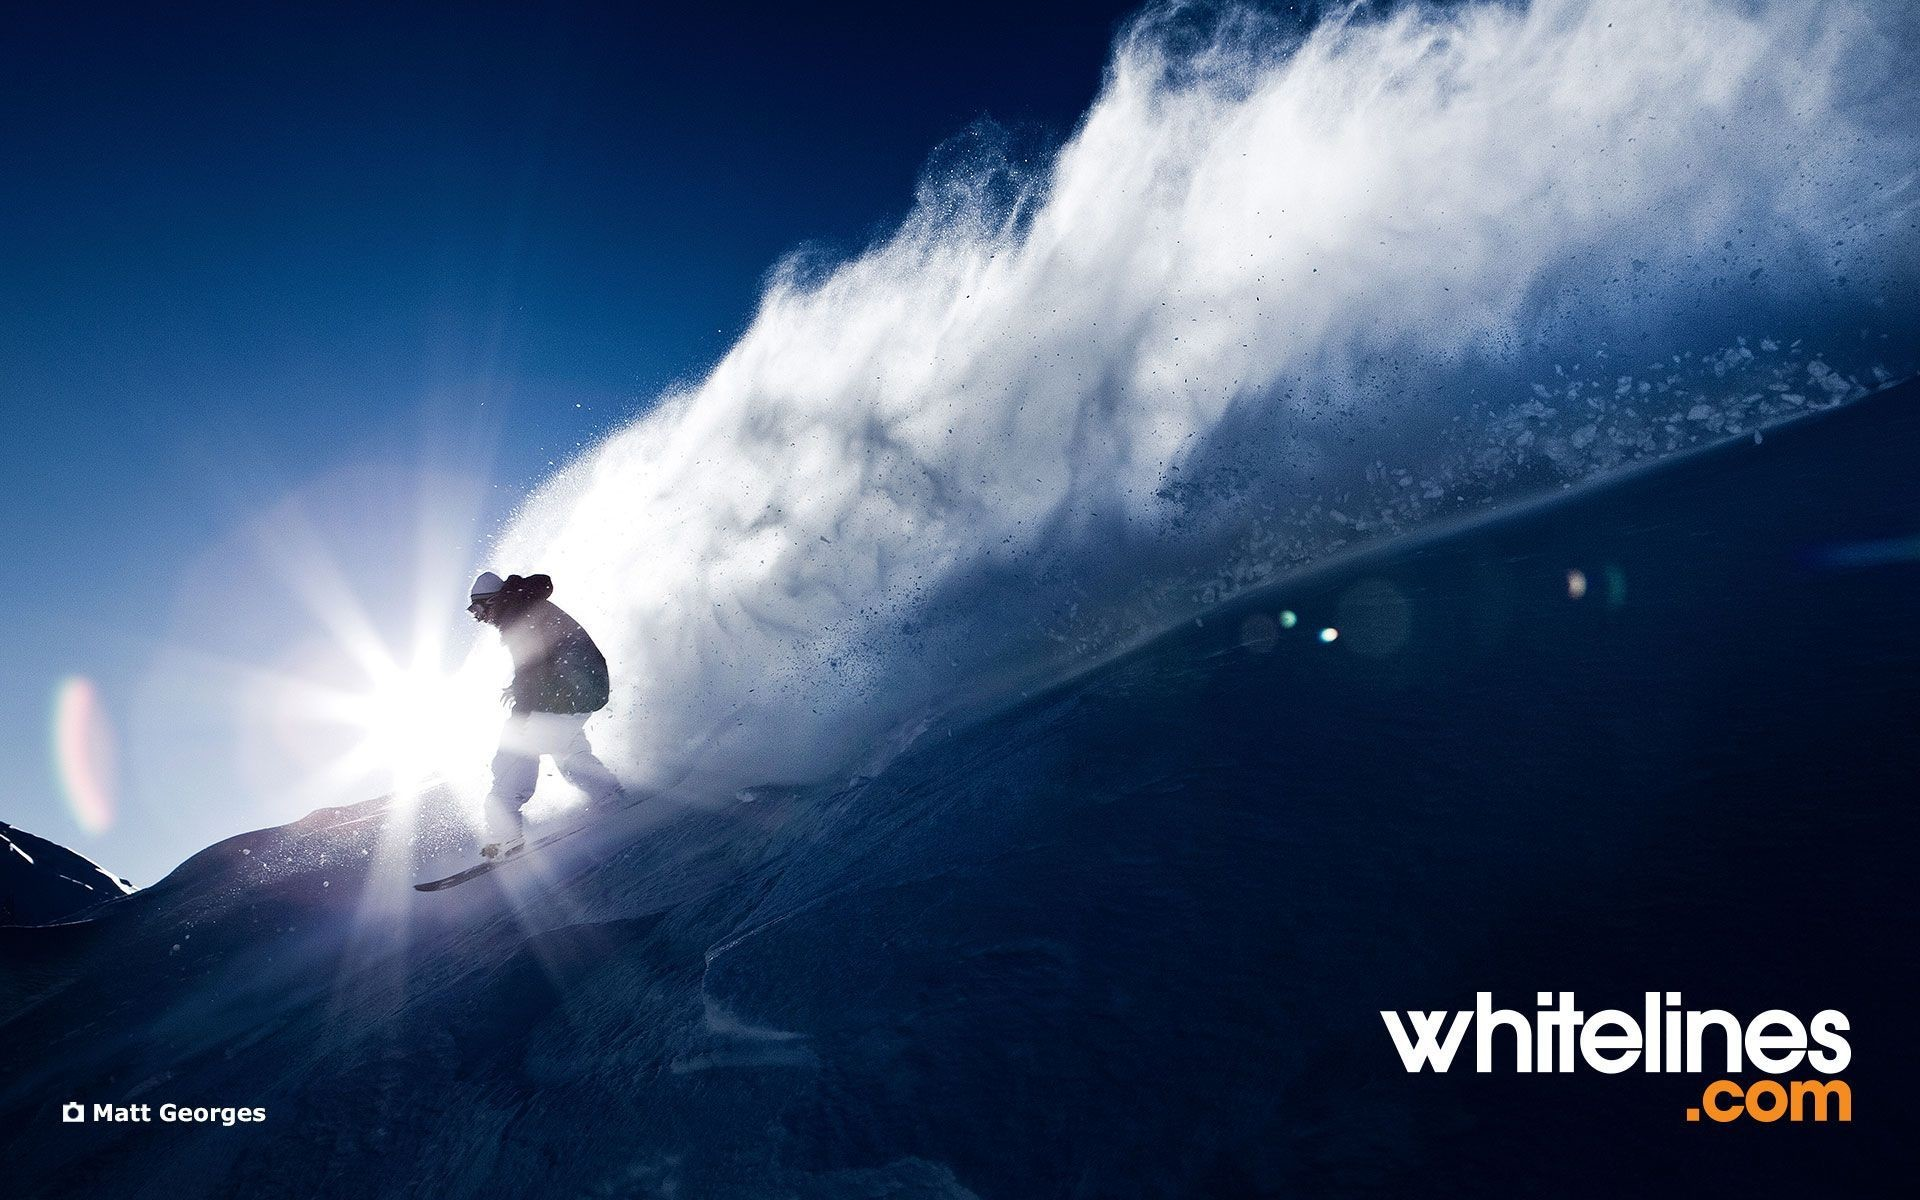 Top Download Snowboarding Wallpaper Powder Images for Pinterest